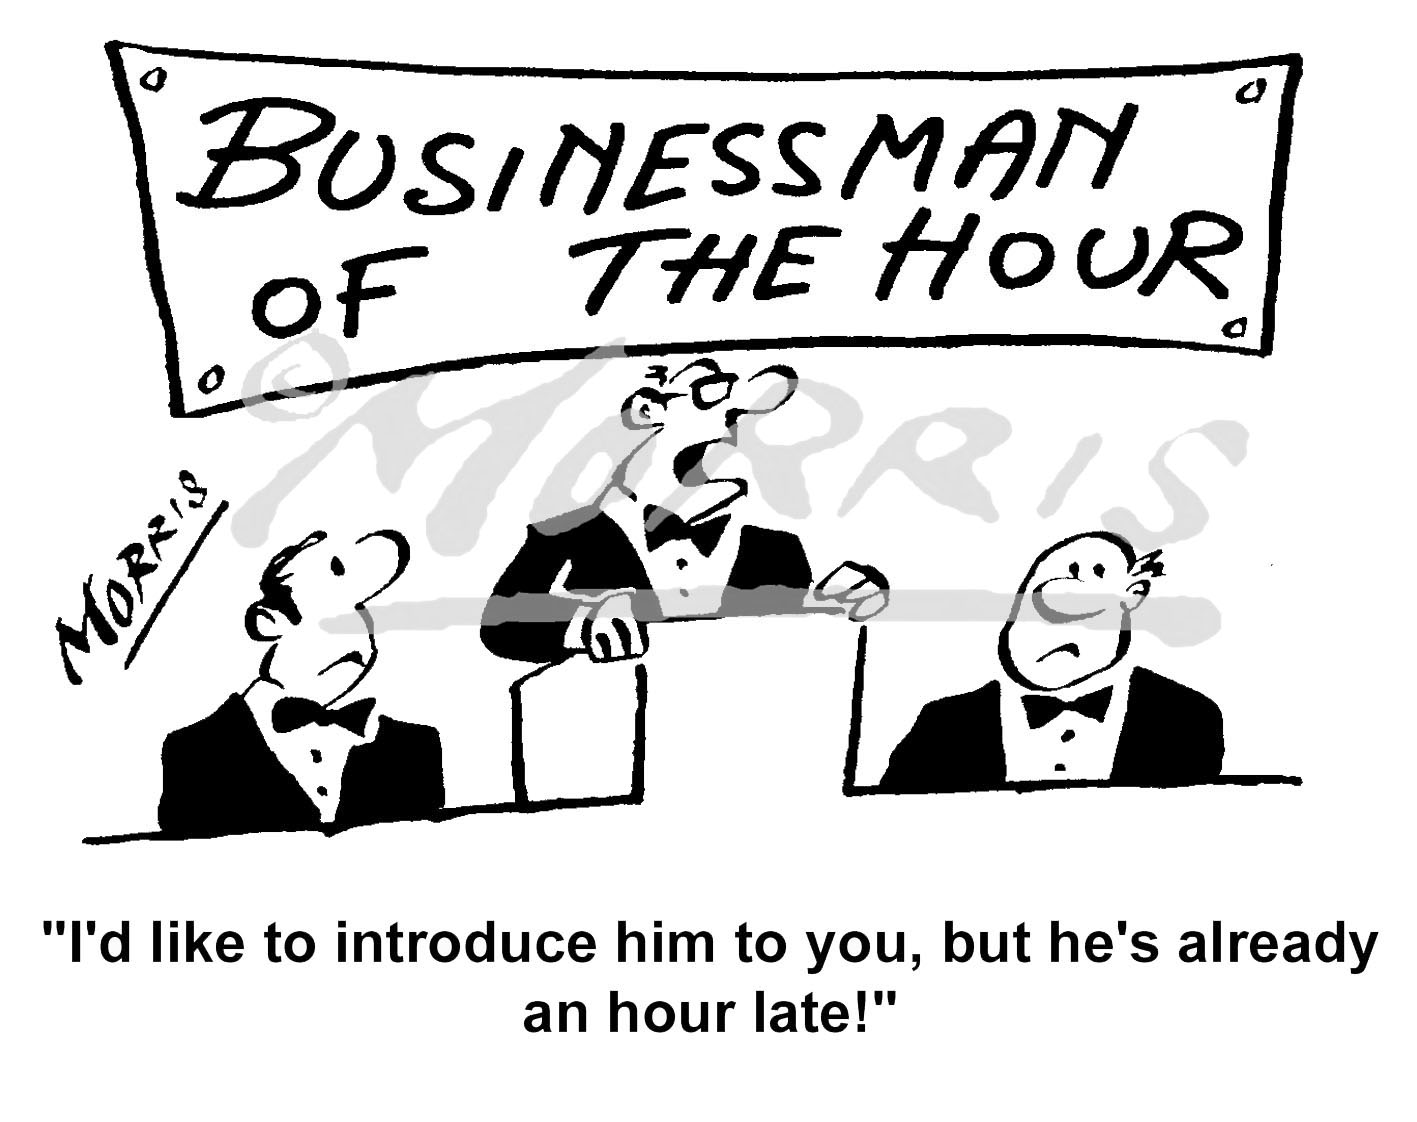 Businessman of the year cartoon – Ref: 6202bw